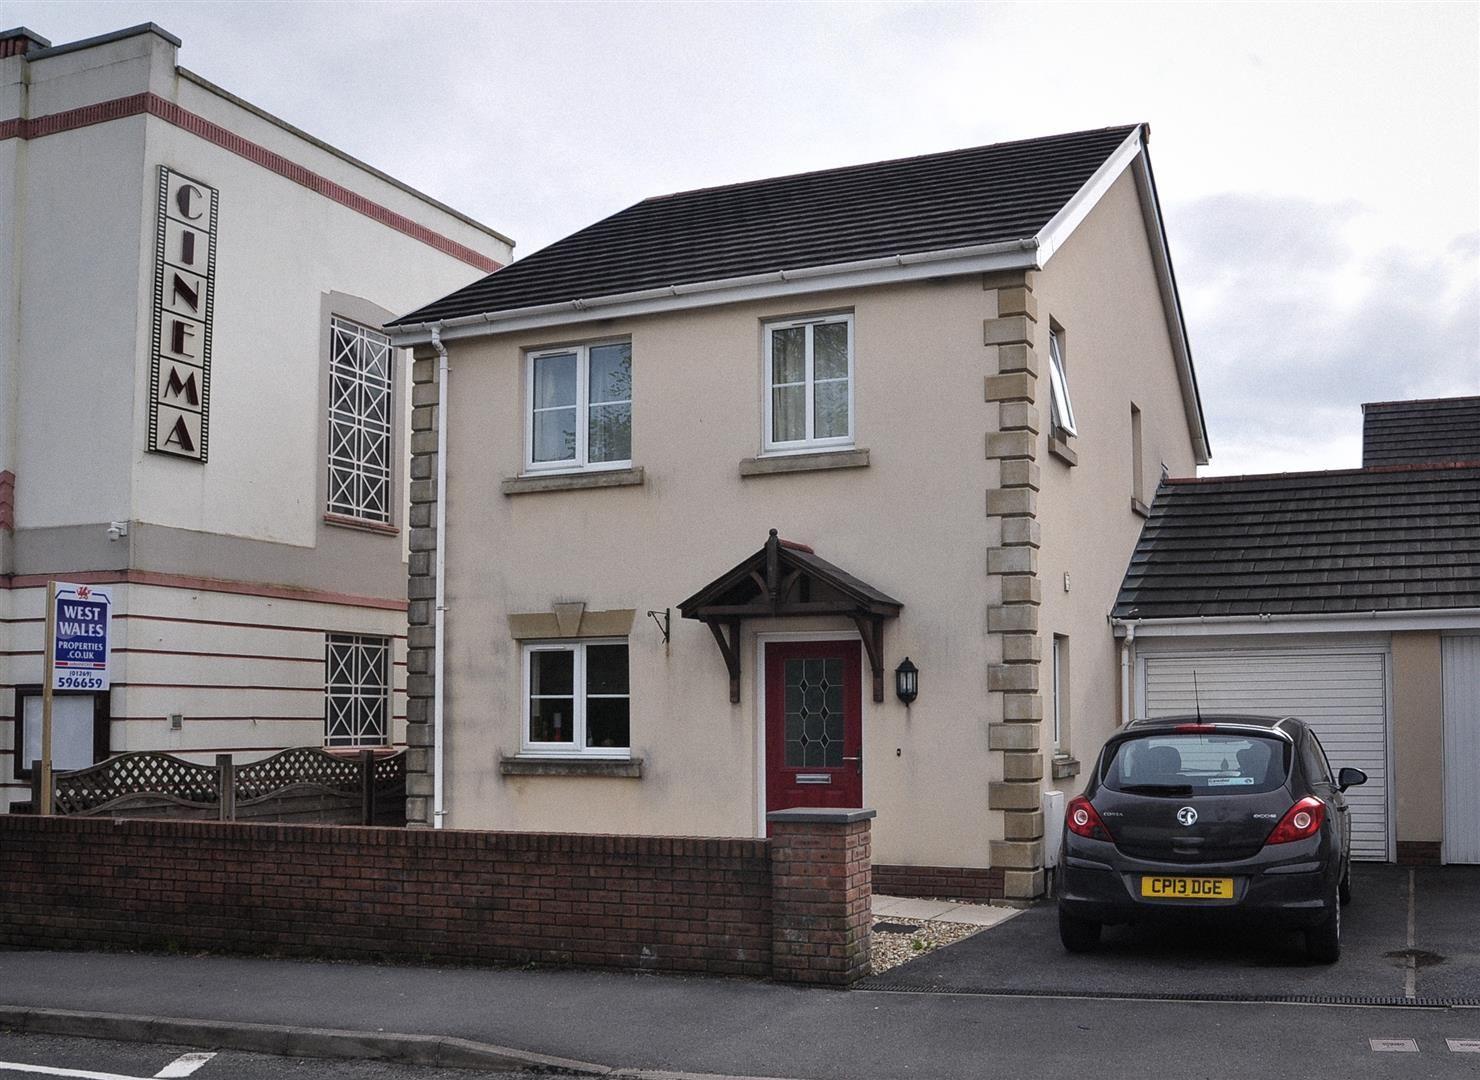 Property photo 1 of 15. Dsc_0436-2.Jpg